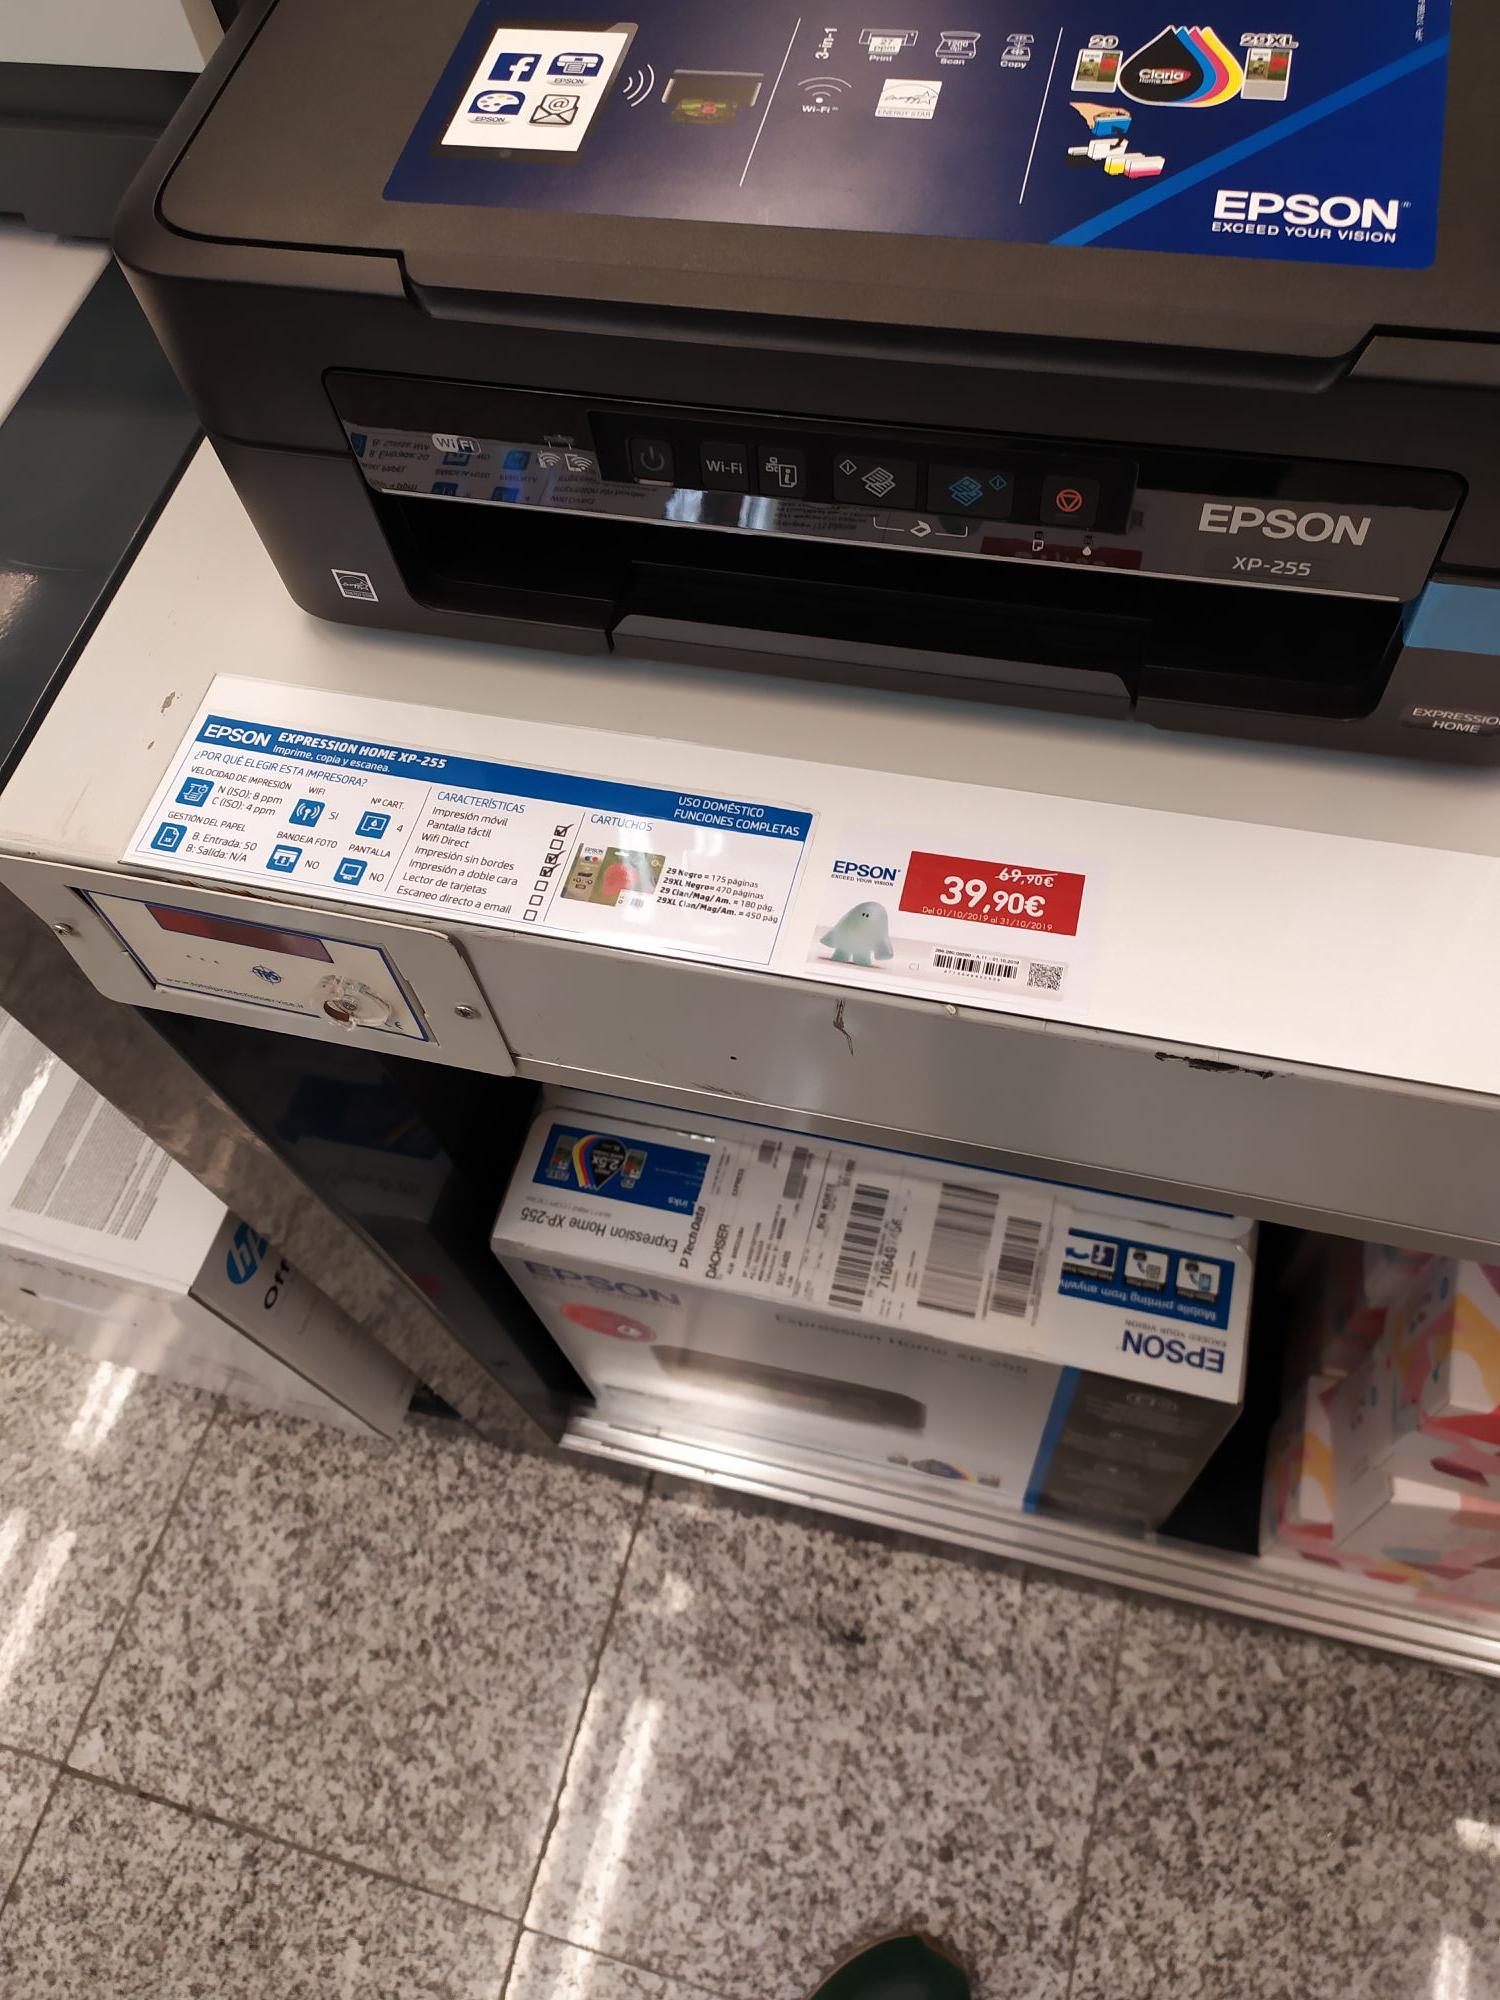 Impresora Epson XP 255